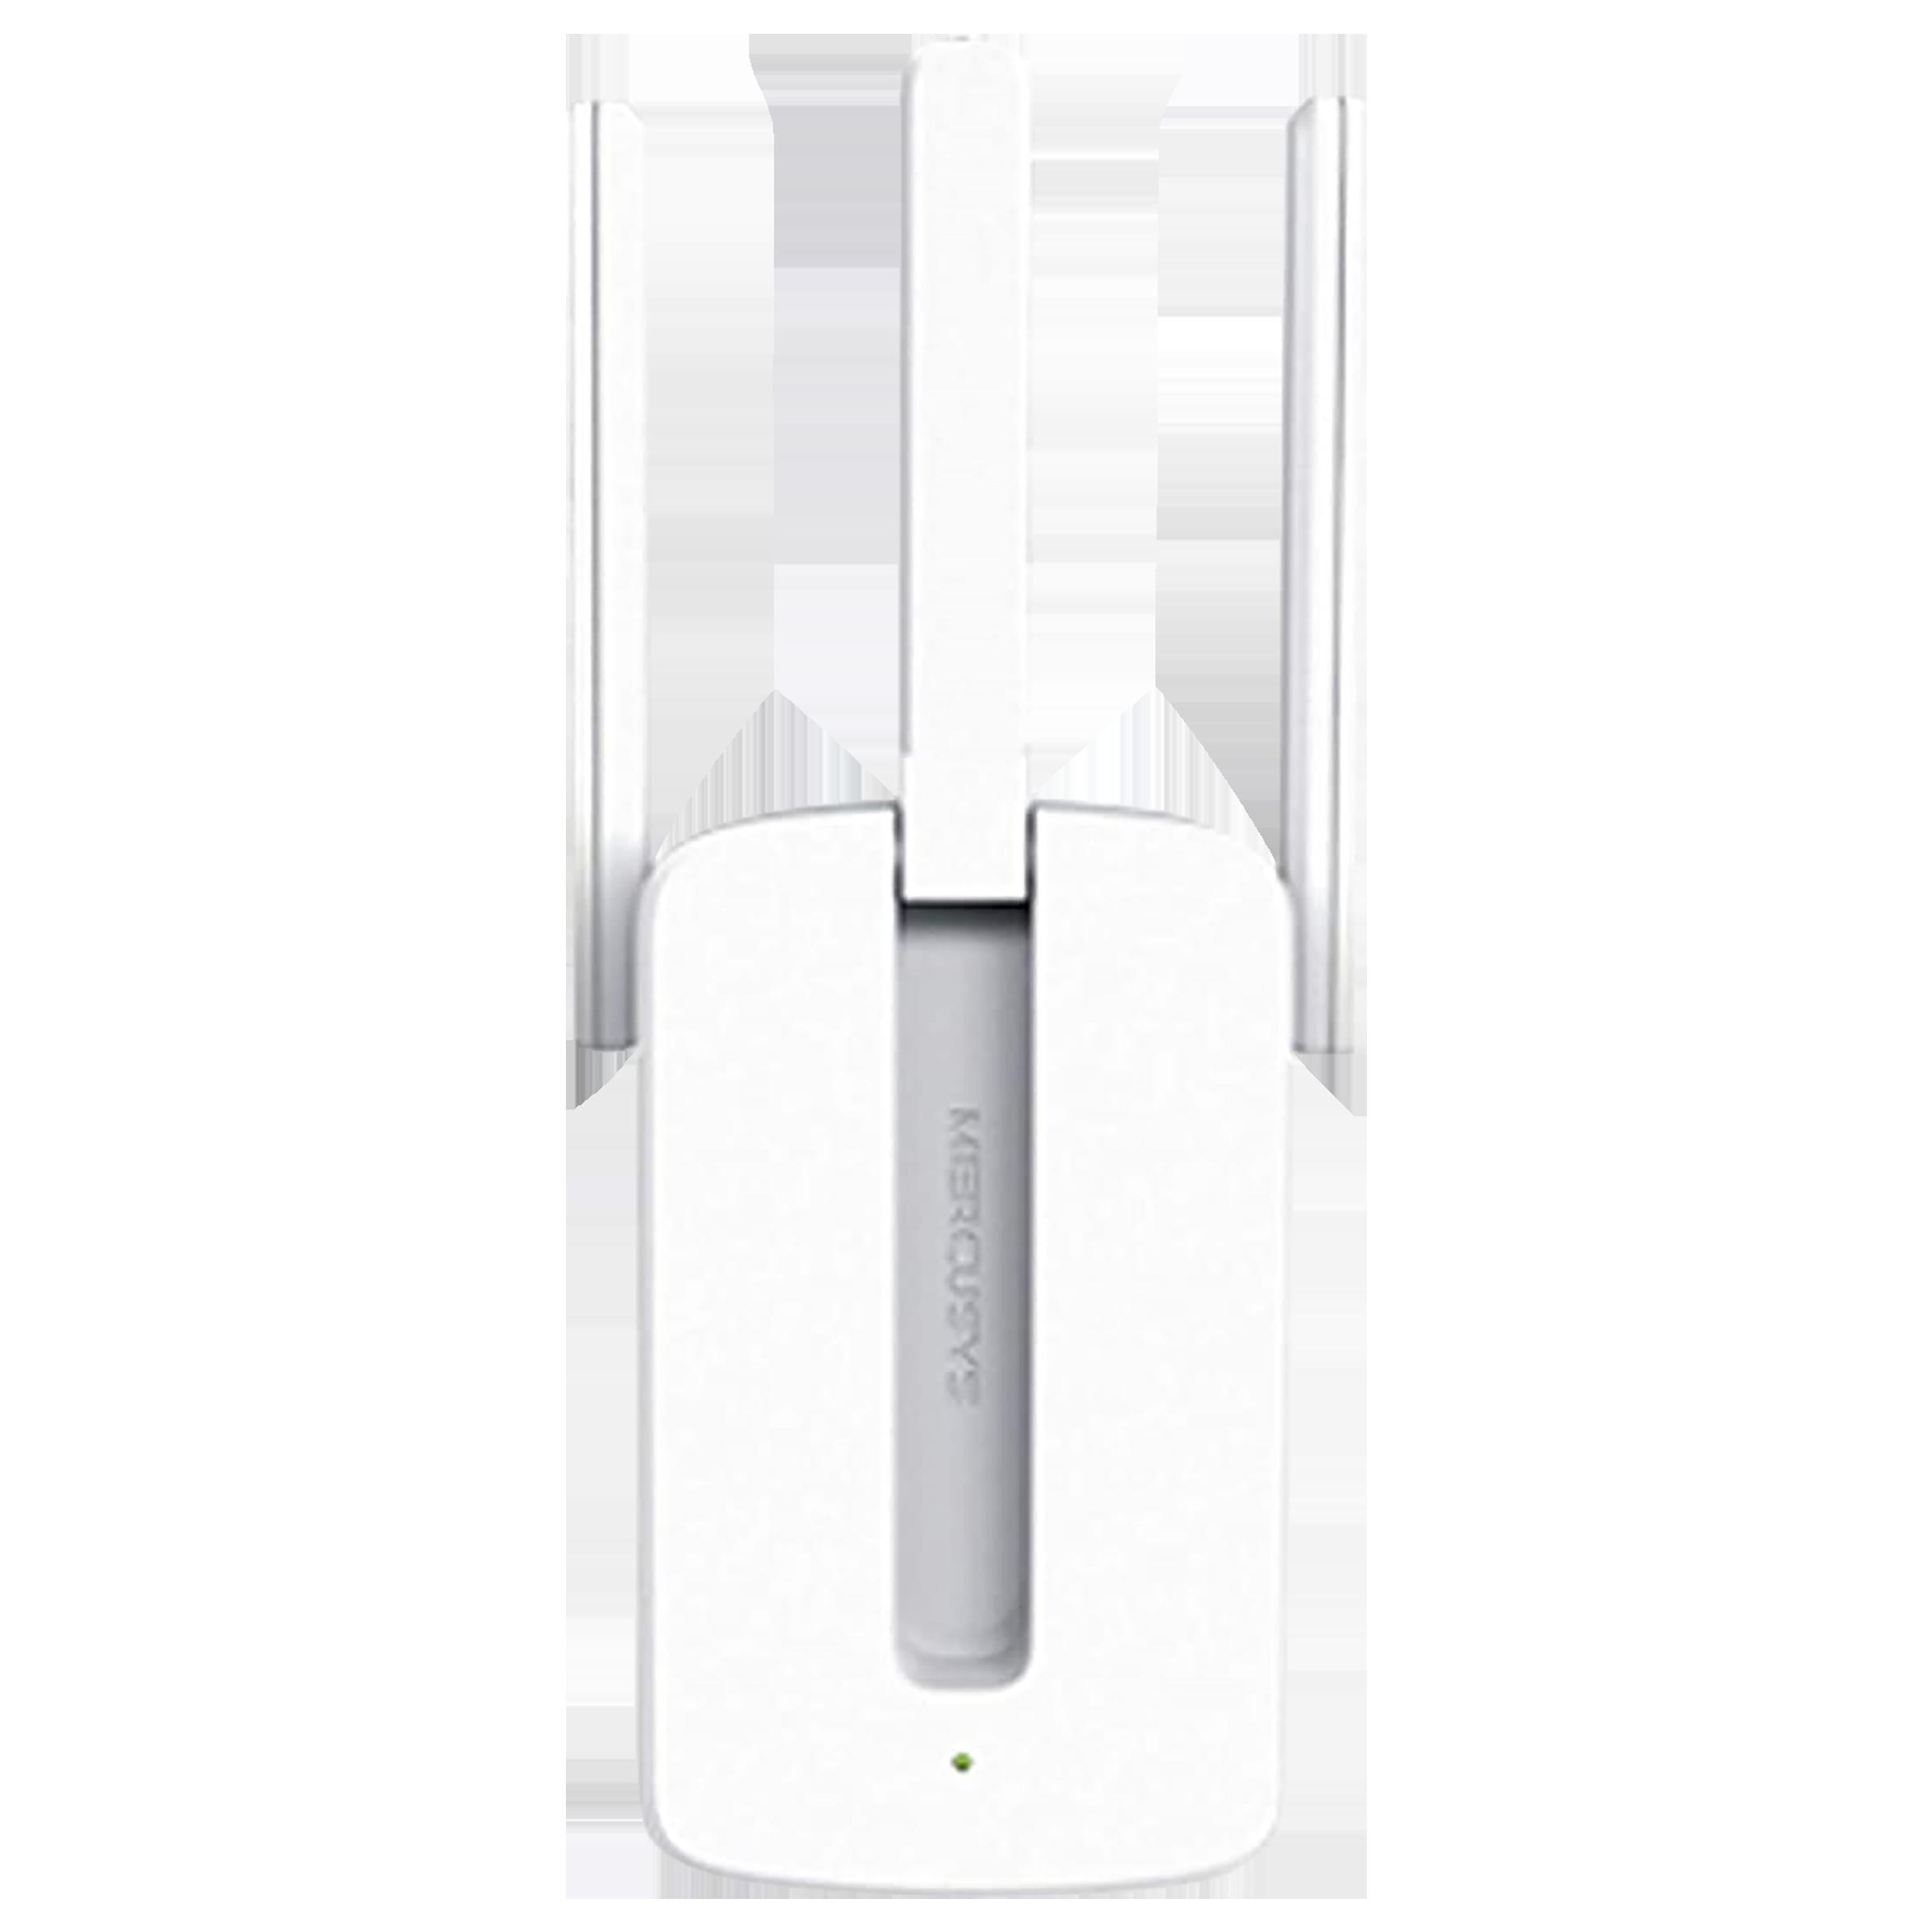 Zyxel MW300RE-M Up to 300Mbps Speed WiFi Range Extender (Superior Extended Range, White)_1